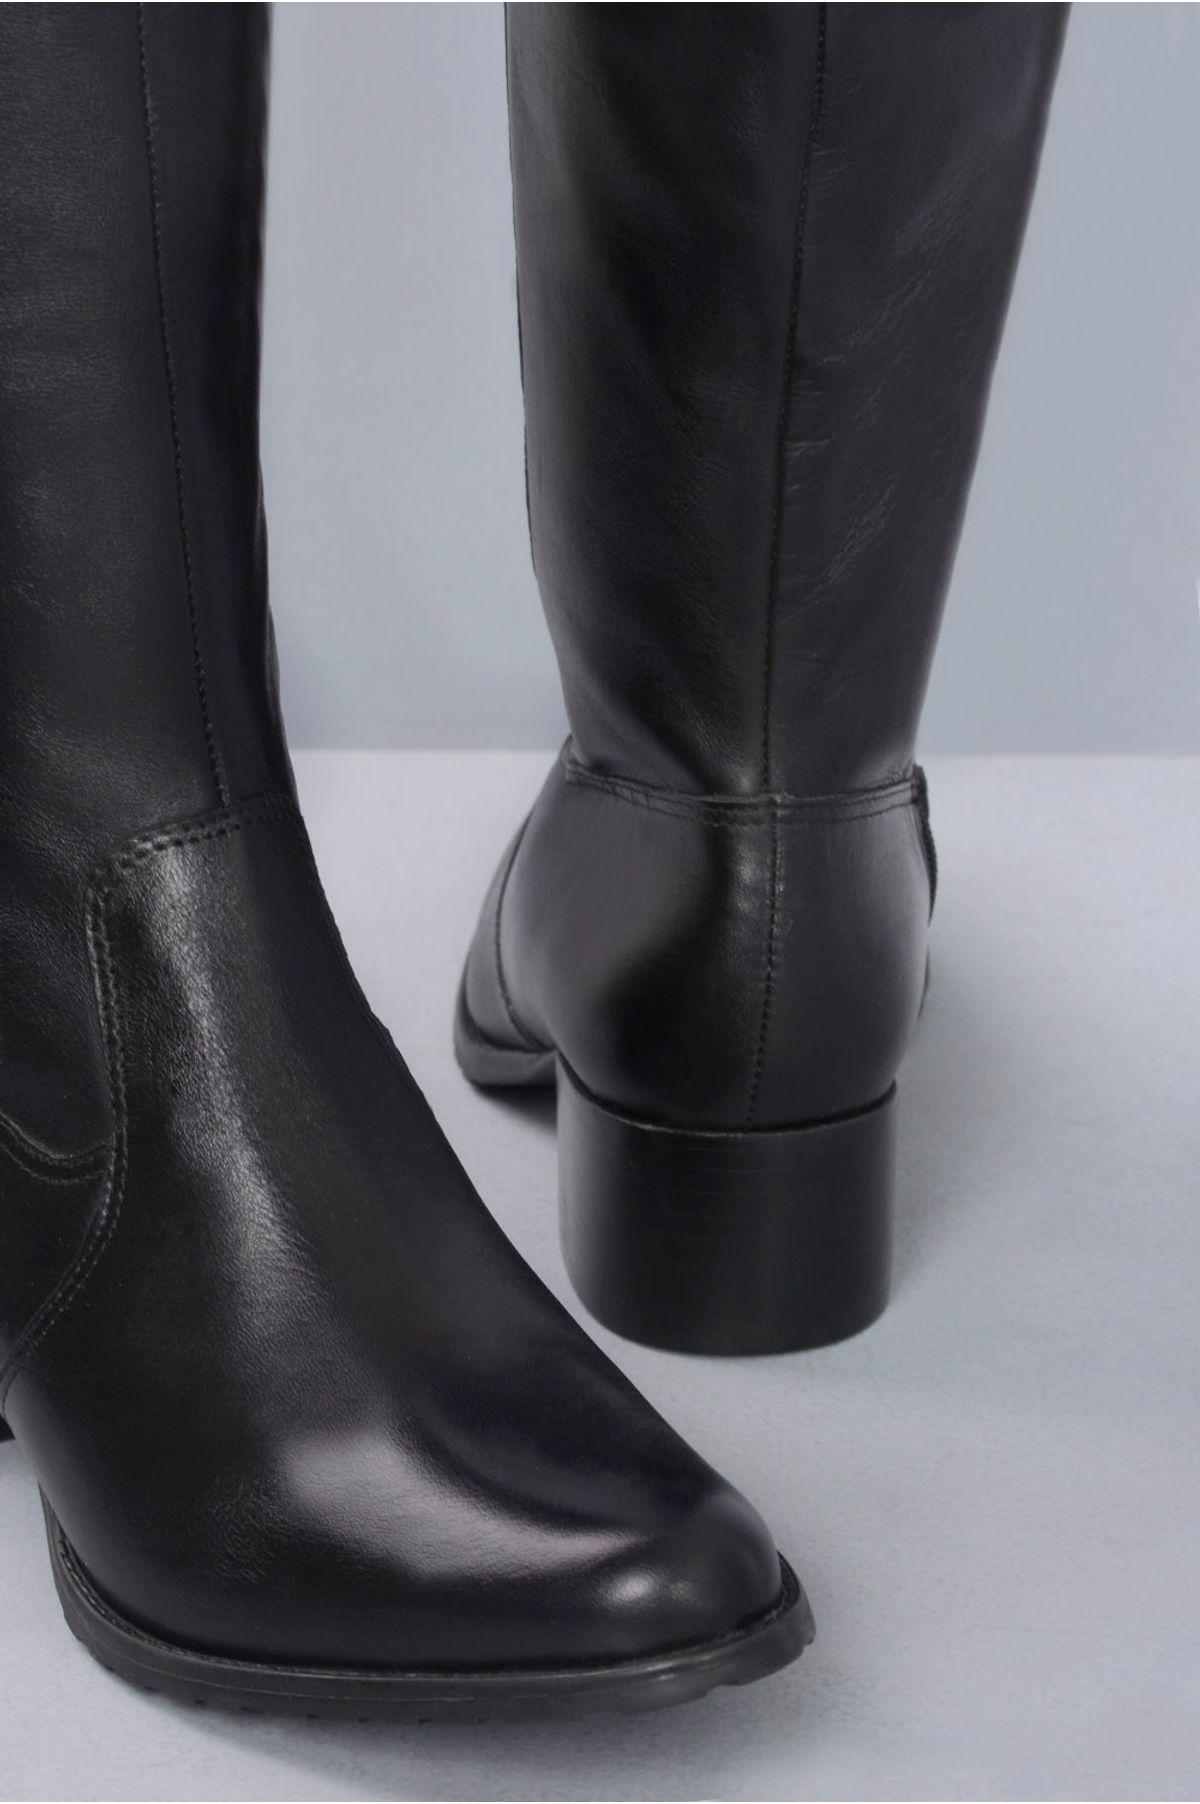 7aad7be9c Bota Feminina Cano Longo Monyser Mundial CR-PRETO - Mundial Calçados